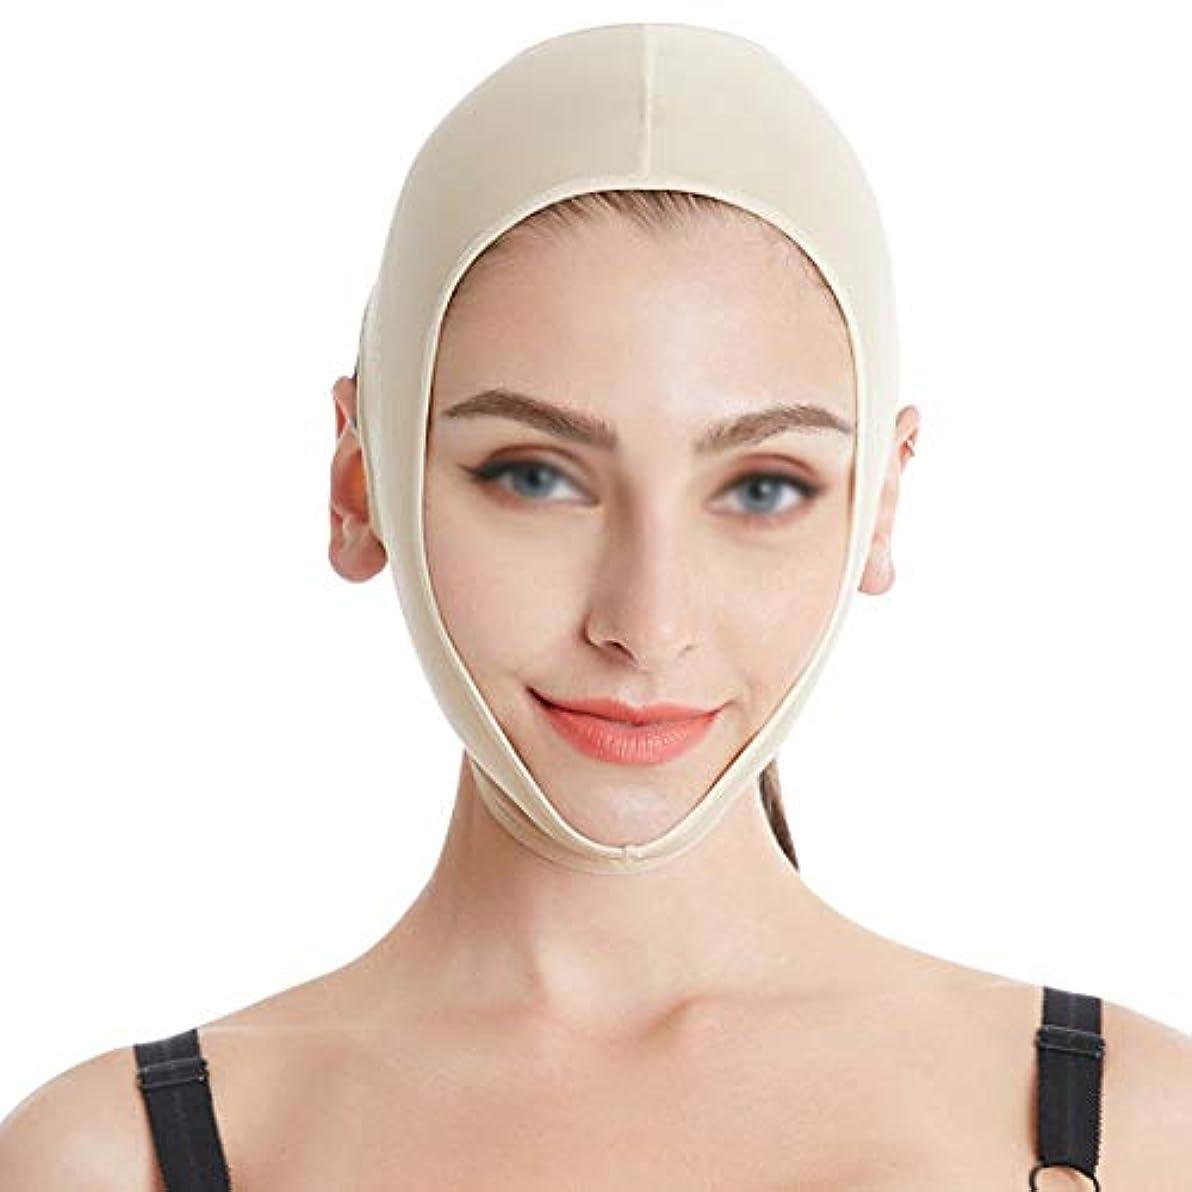 ZWBD フェイスマスク, 顔を持ち上げる包帯V顔薄い顔包帯マスク持ち上がる引き締め睡眠フード顔彫刻形状を二重あごに (Size : L)